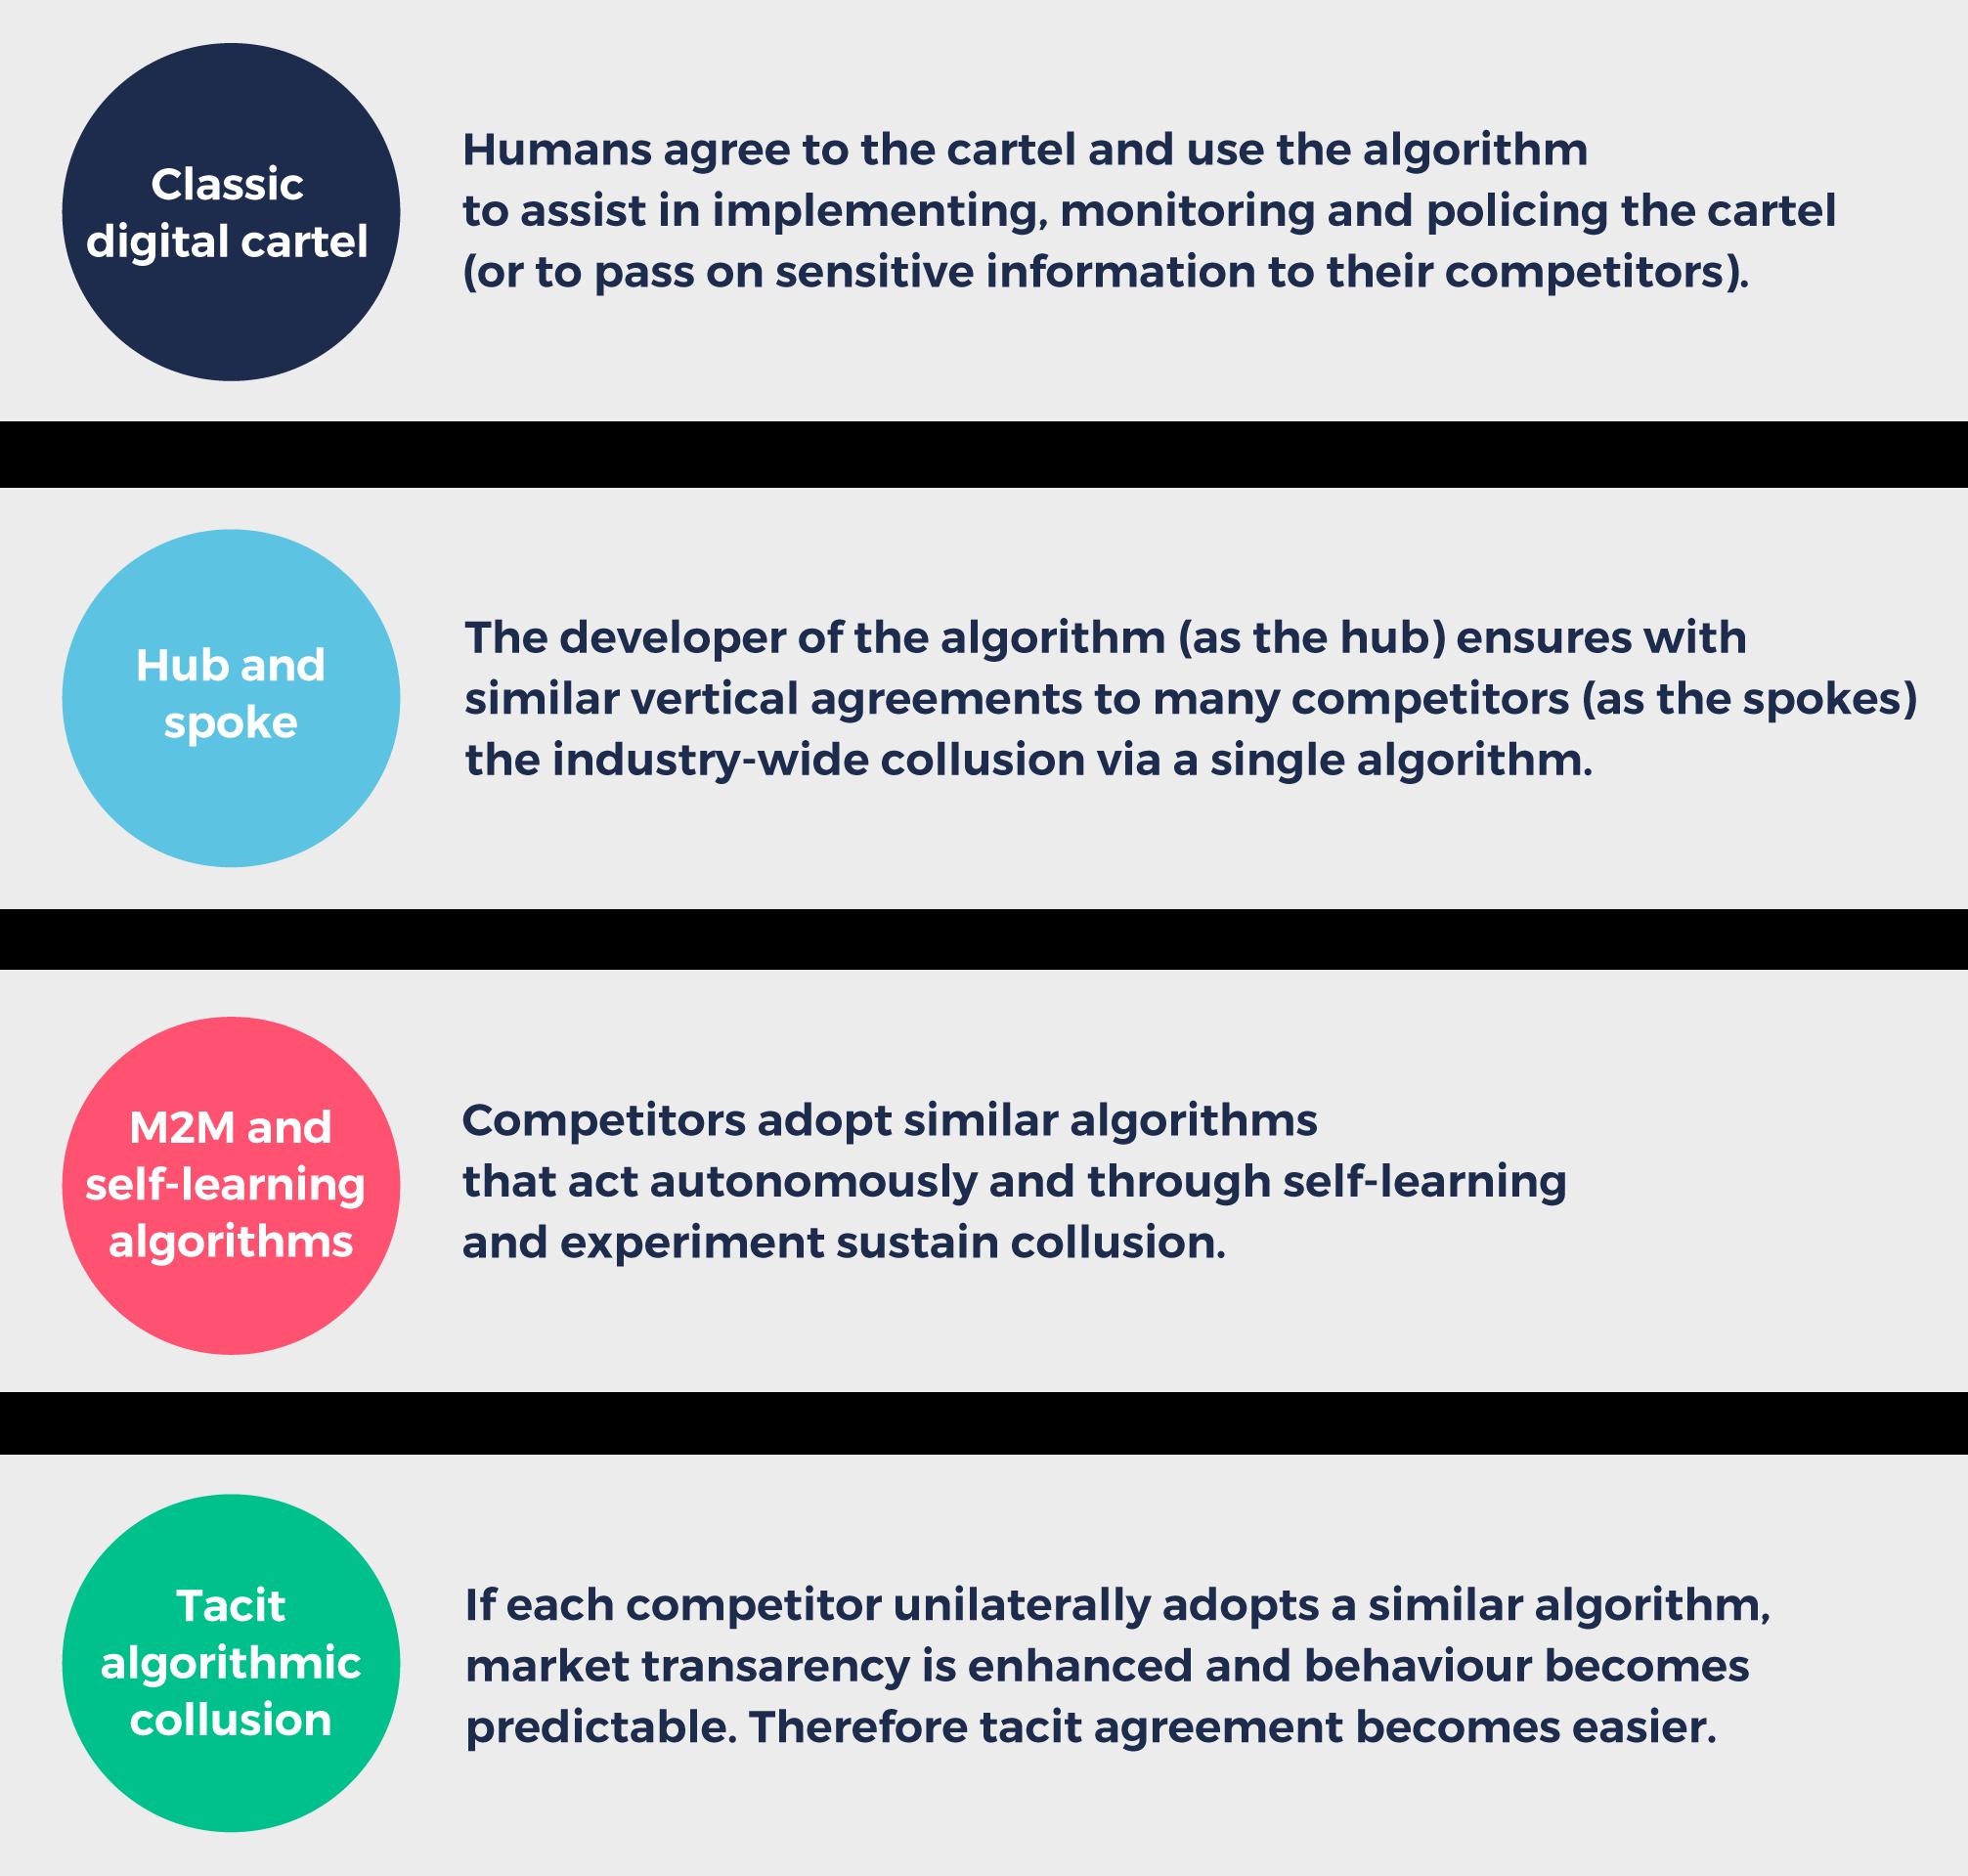 Pricing algorithms: the digital collusion scenarios